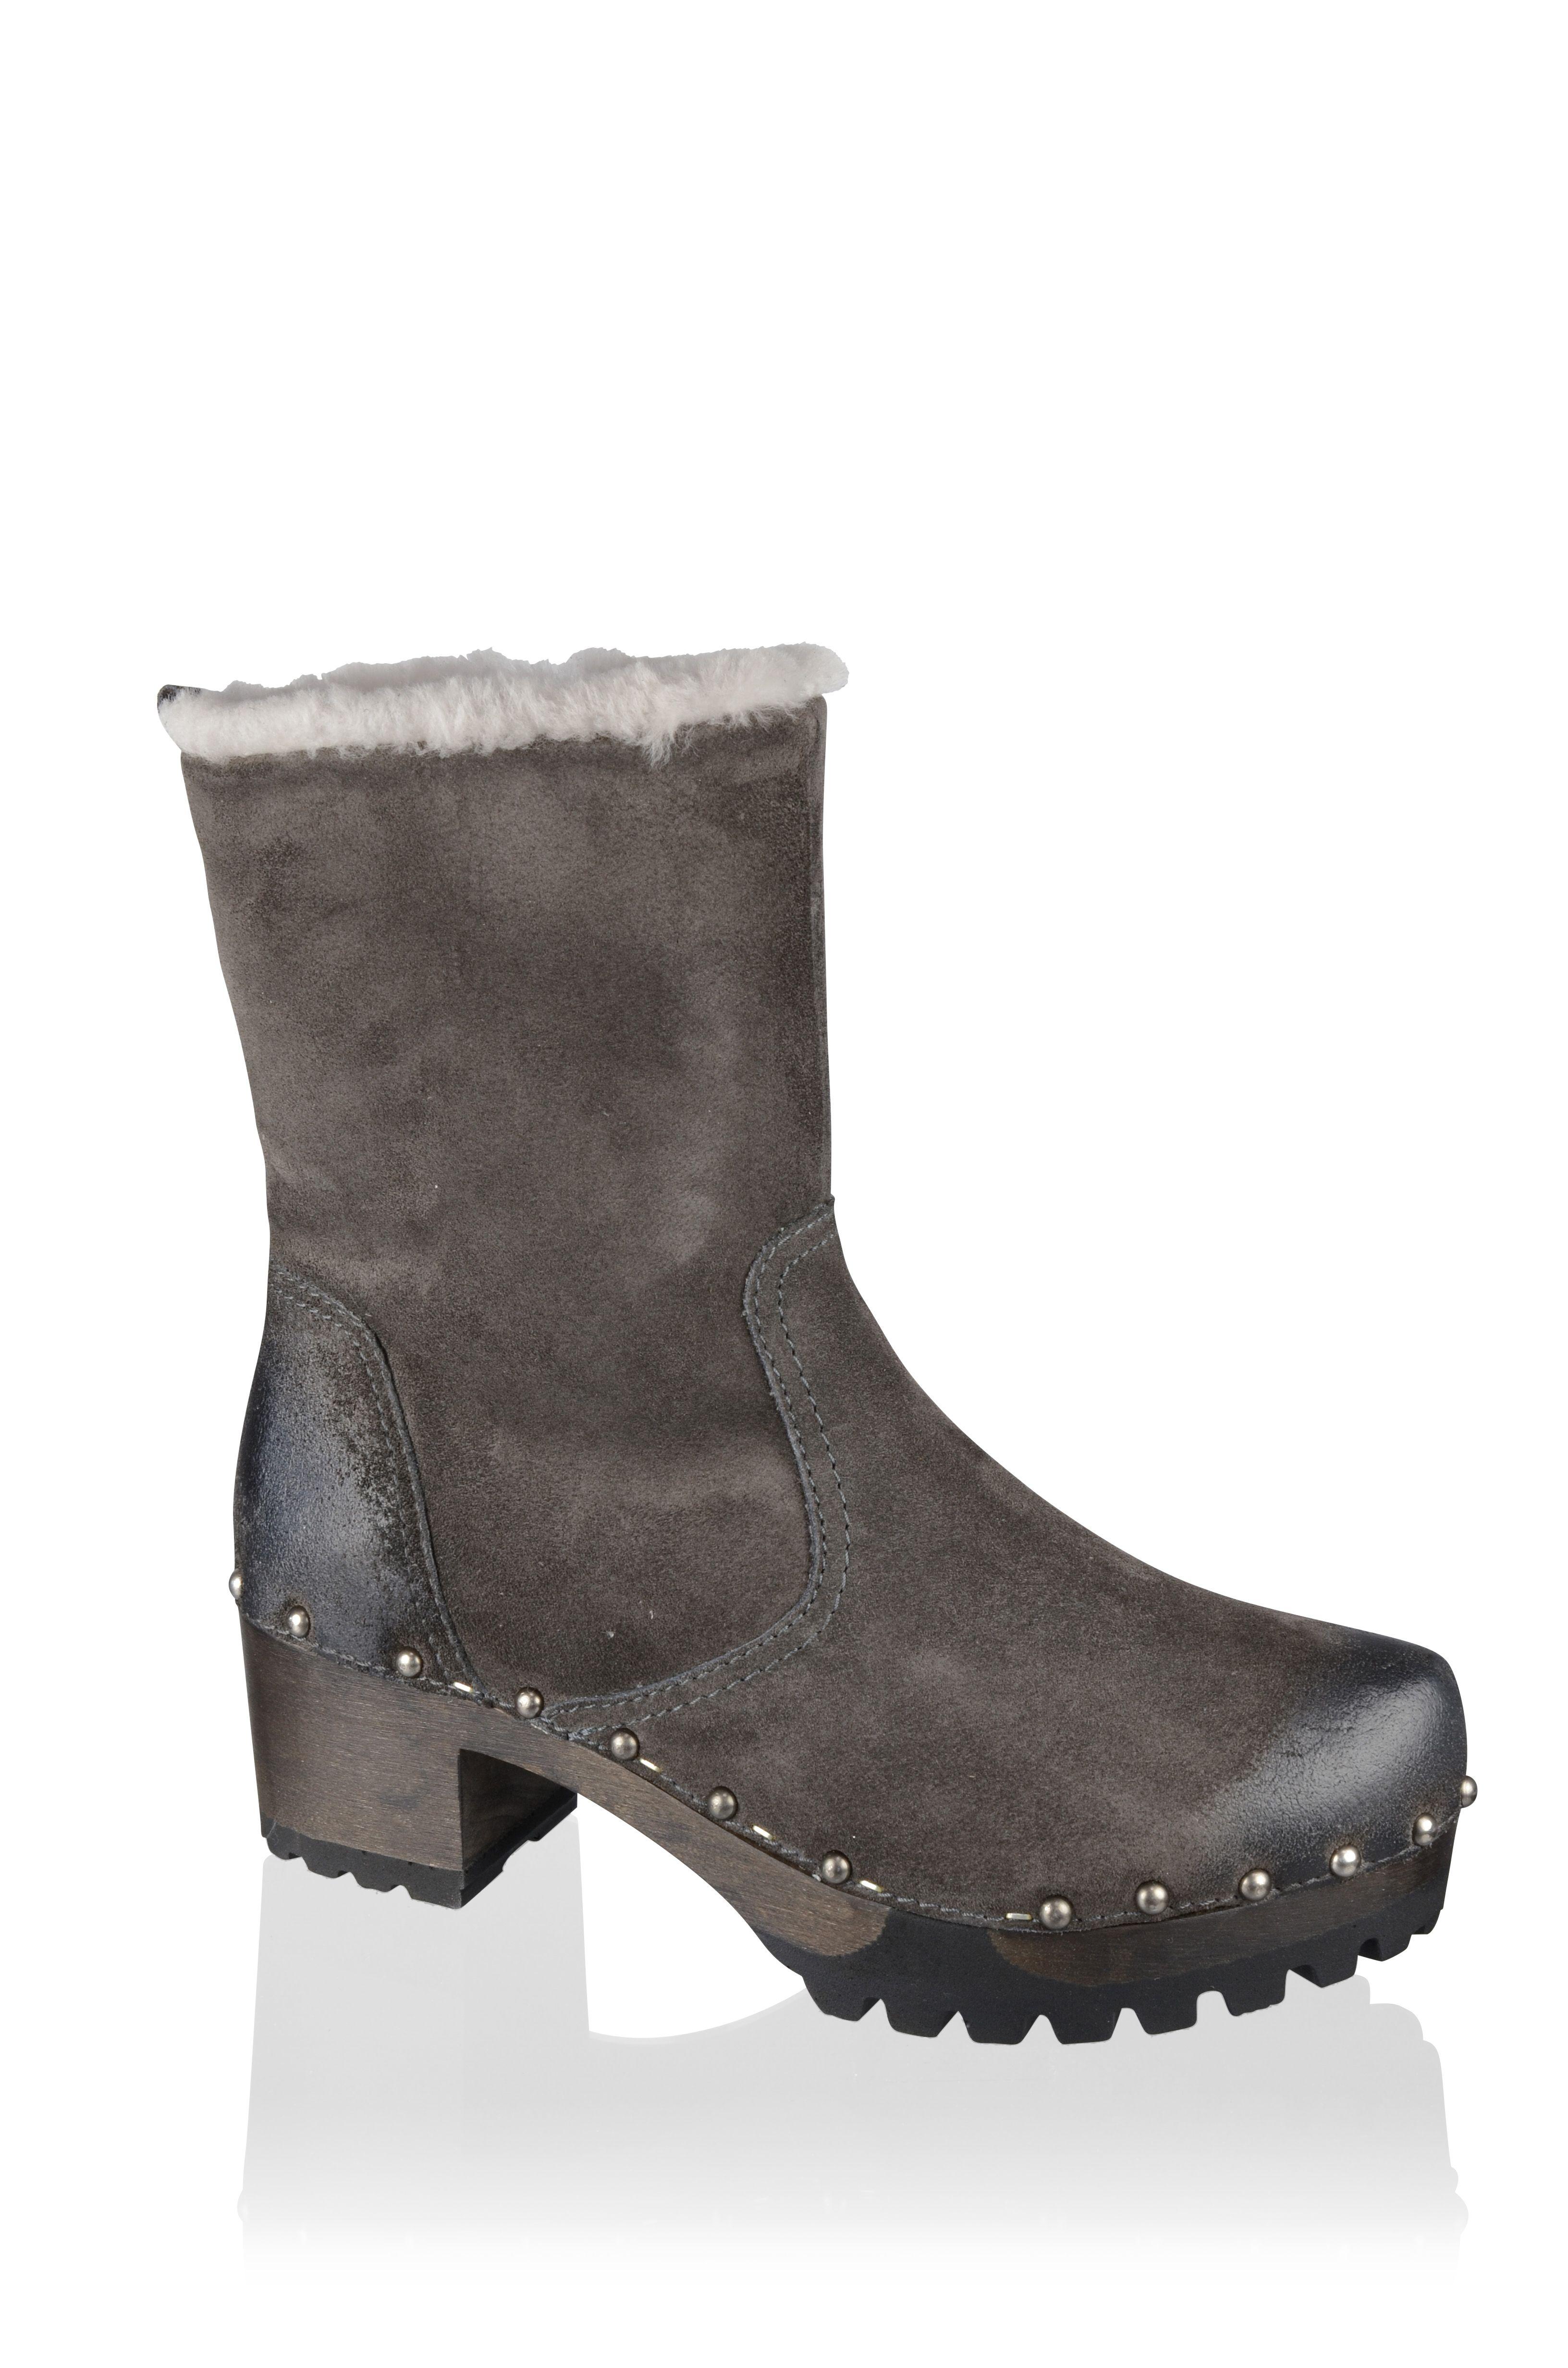 Ina, Bailey, lava #softclox #munich #lampwool #lava #woddensole #darksole #winter #wintershoes #veloursleather #wood #shoes #clogs